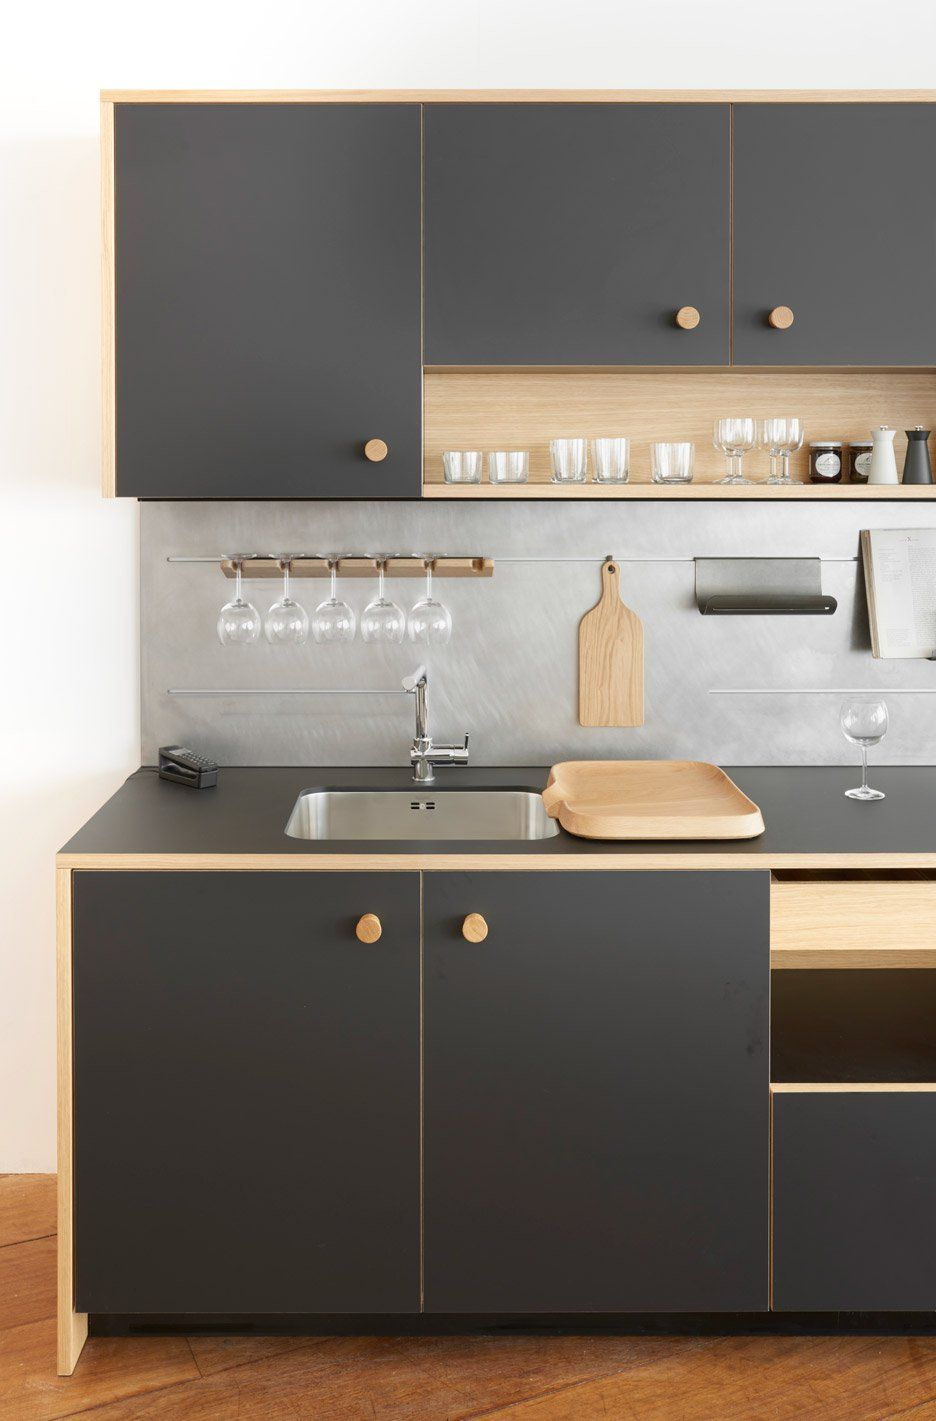 Jasper Morrison designs first kitchen for Schiffini - blogs de ...